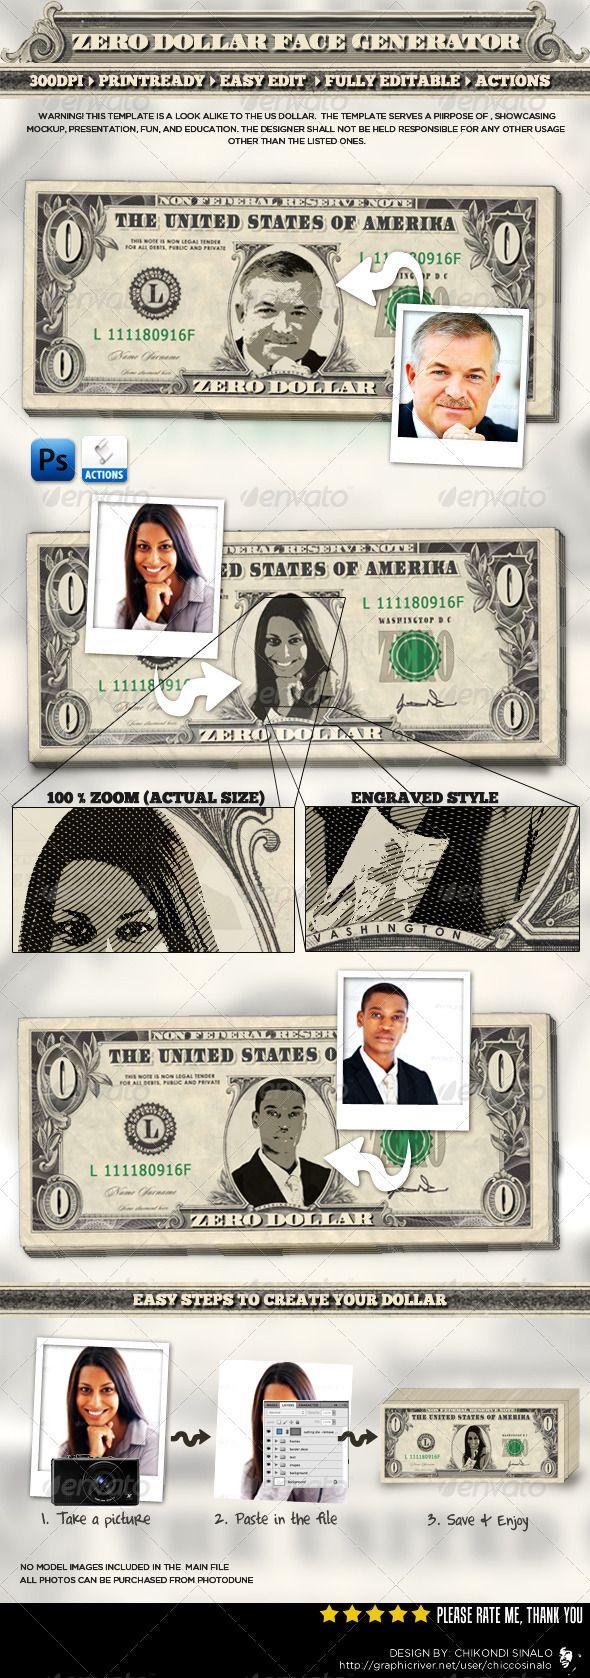 Zero Dollar Face Generator Actions P Oshop Conception De Brochure Zero